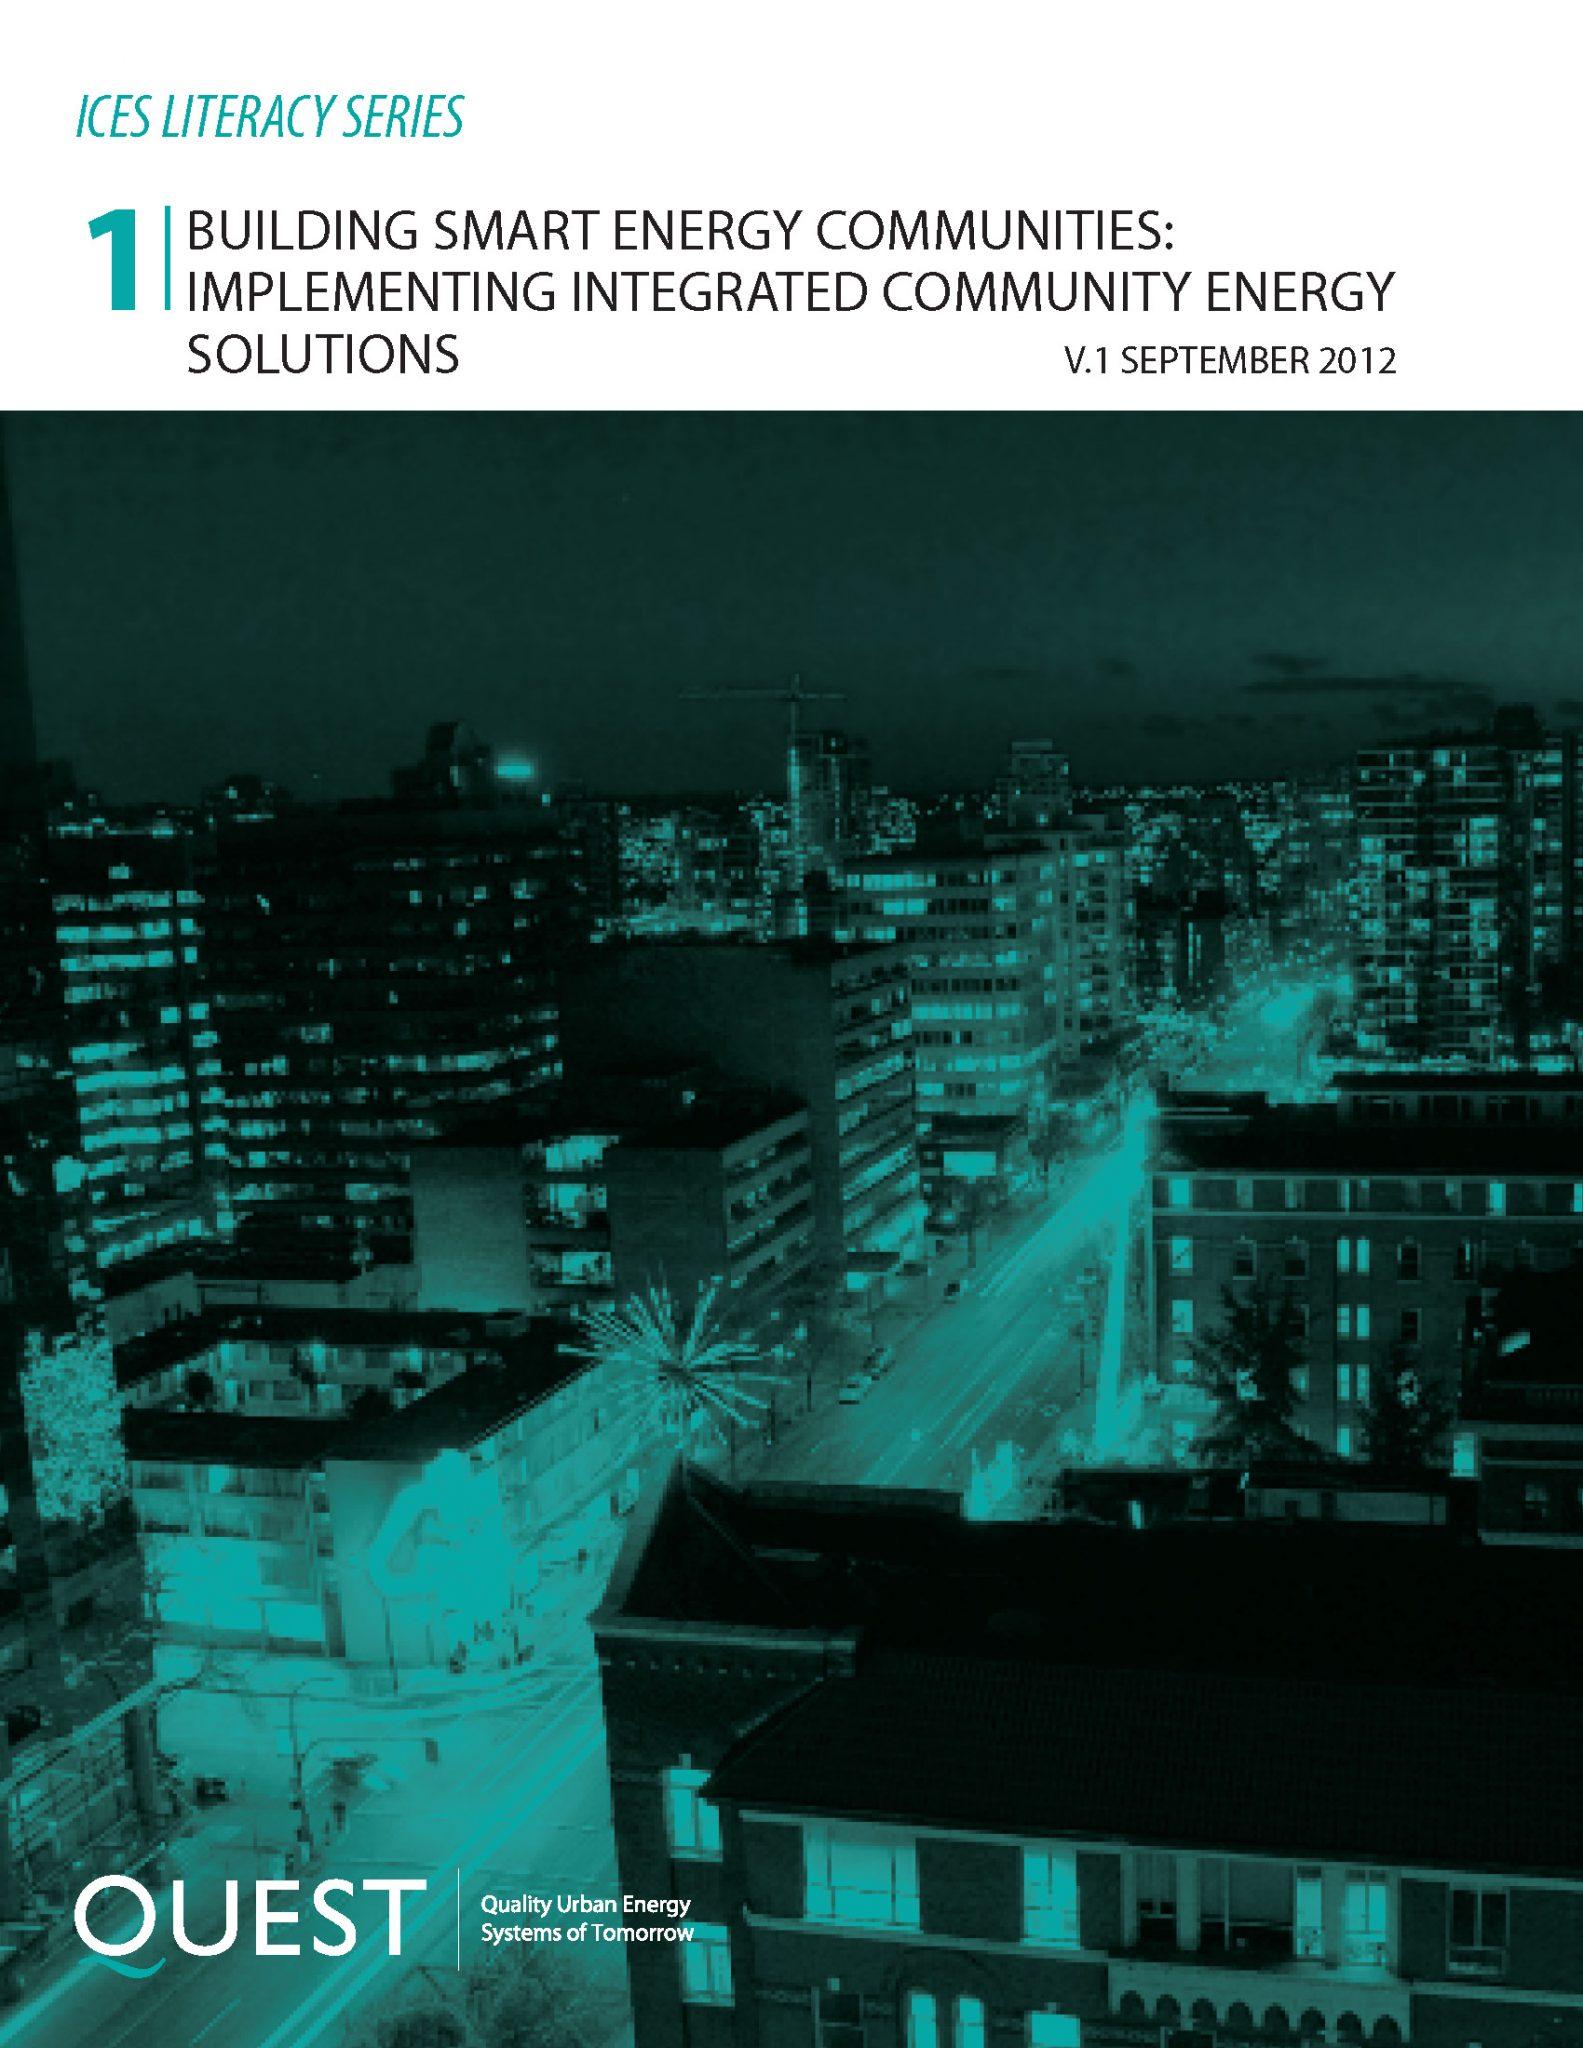 Paper No. 1 Building Smart Energy Communities